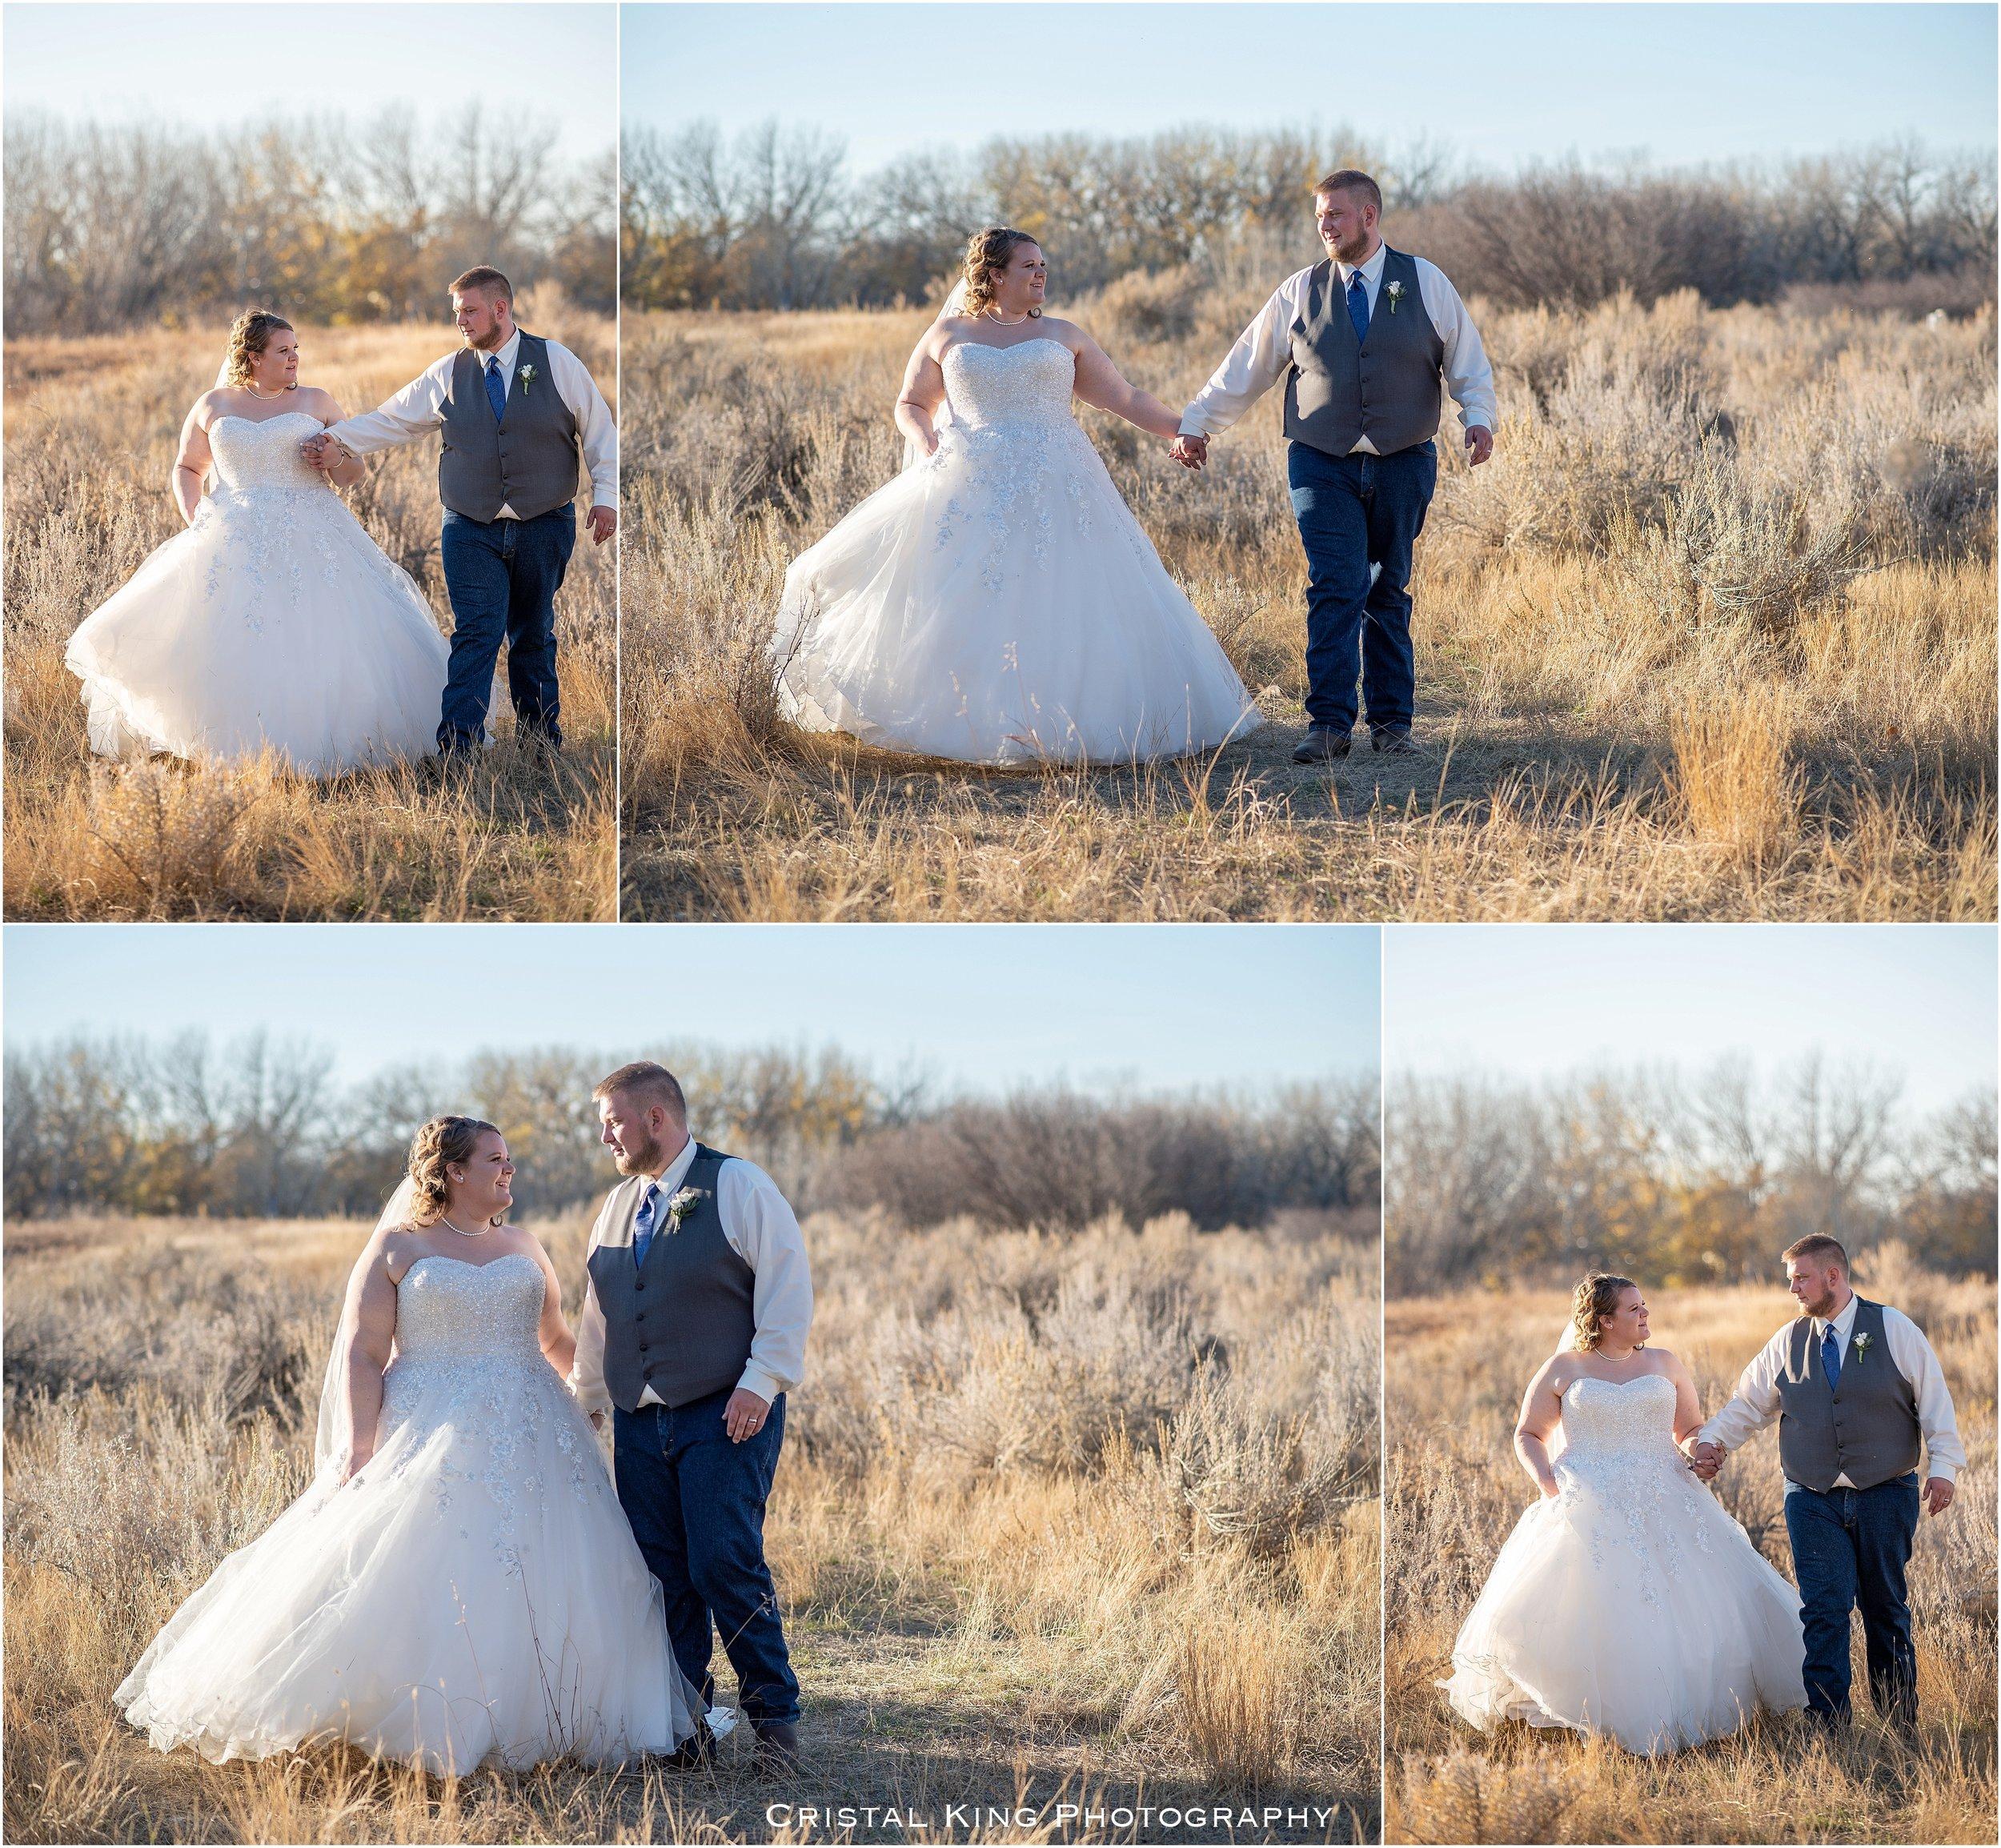 Tracy-Kyles-Wedding-140.jpg